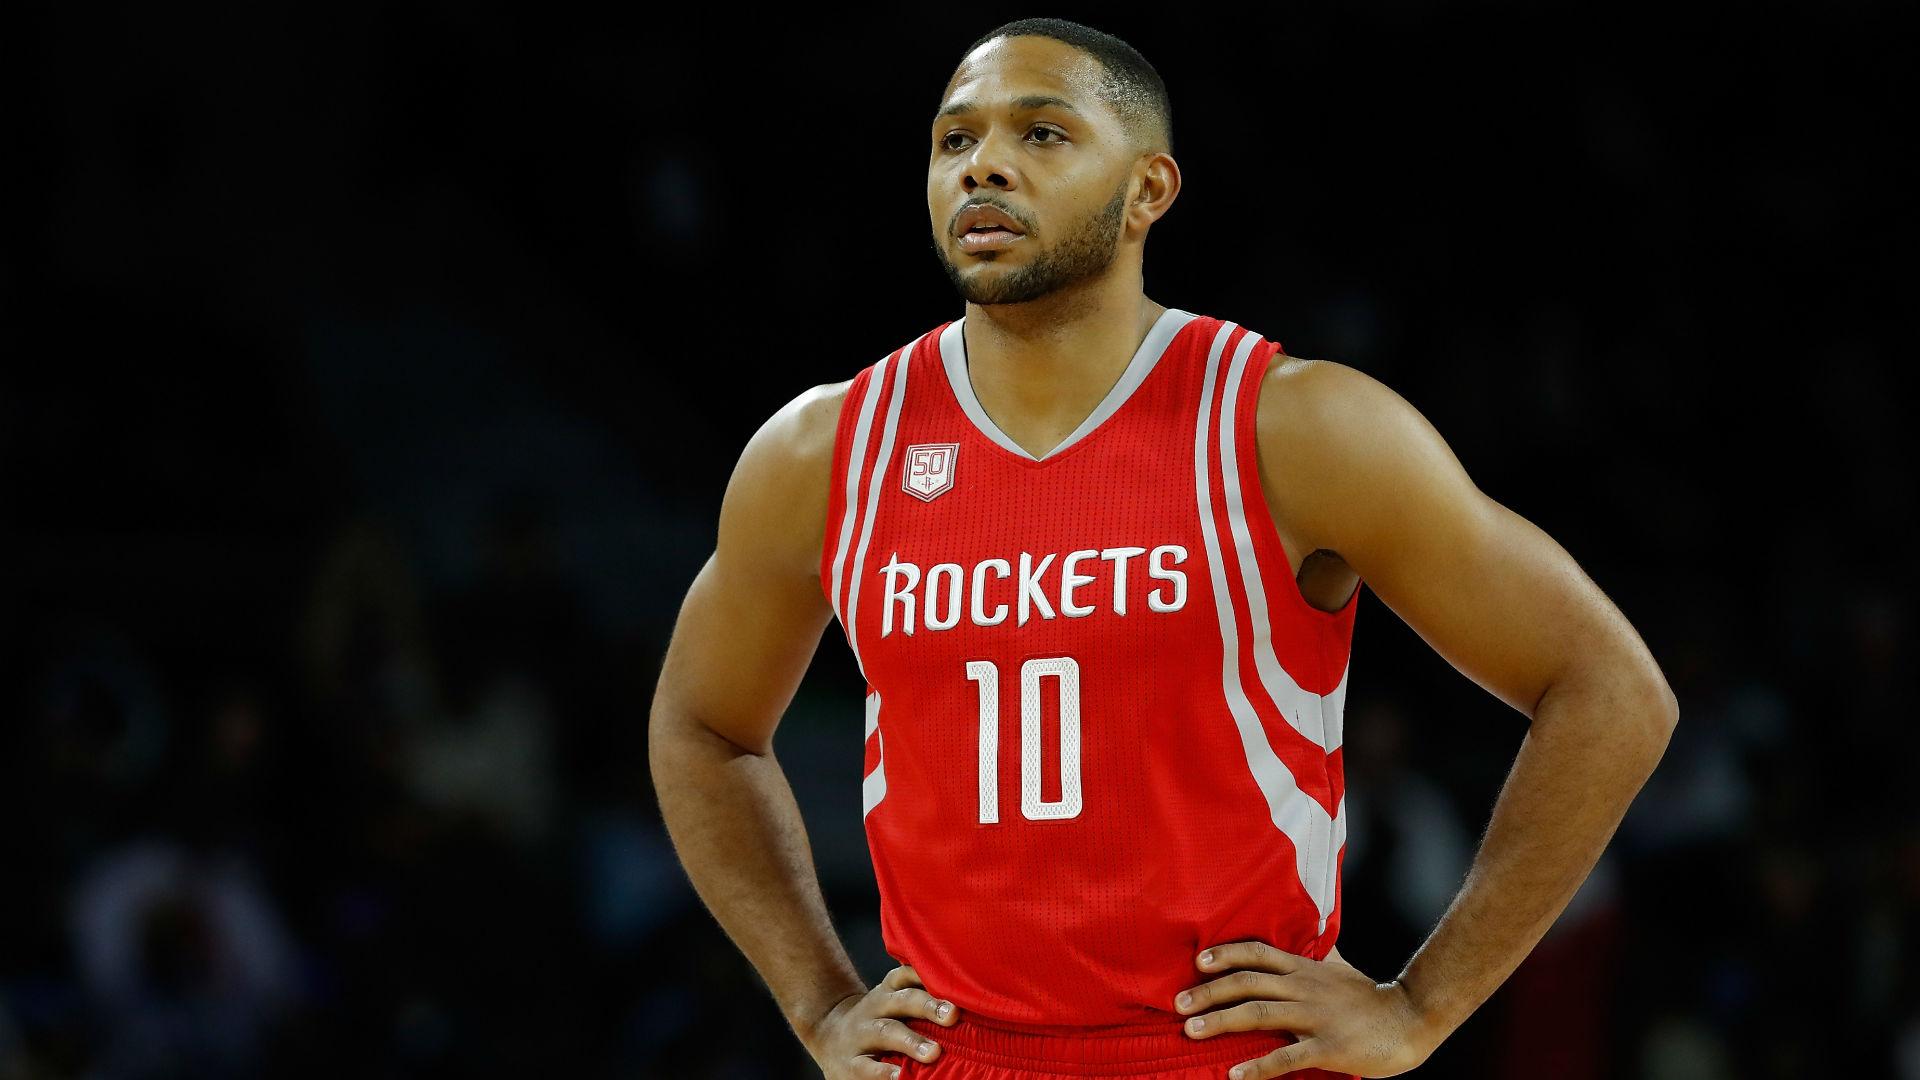 Eric Gordon drains buzzer-beater to lead Rockets past 76ers